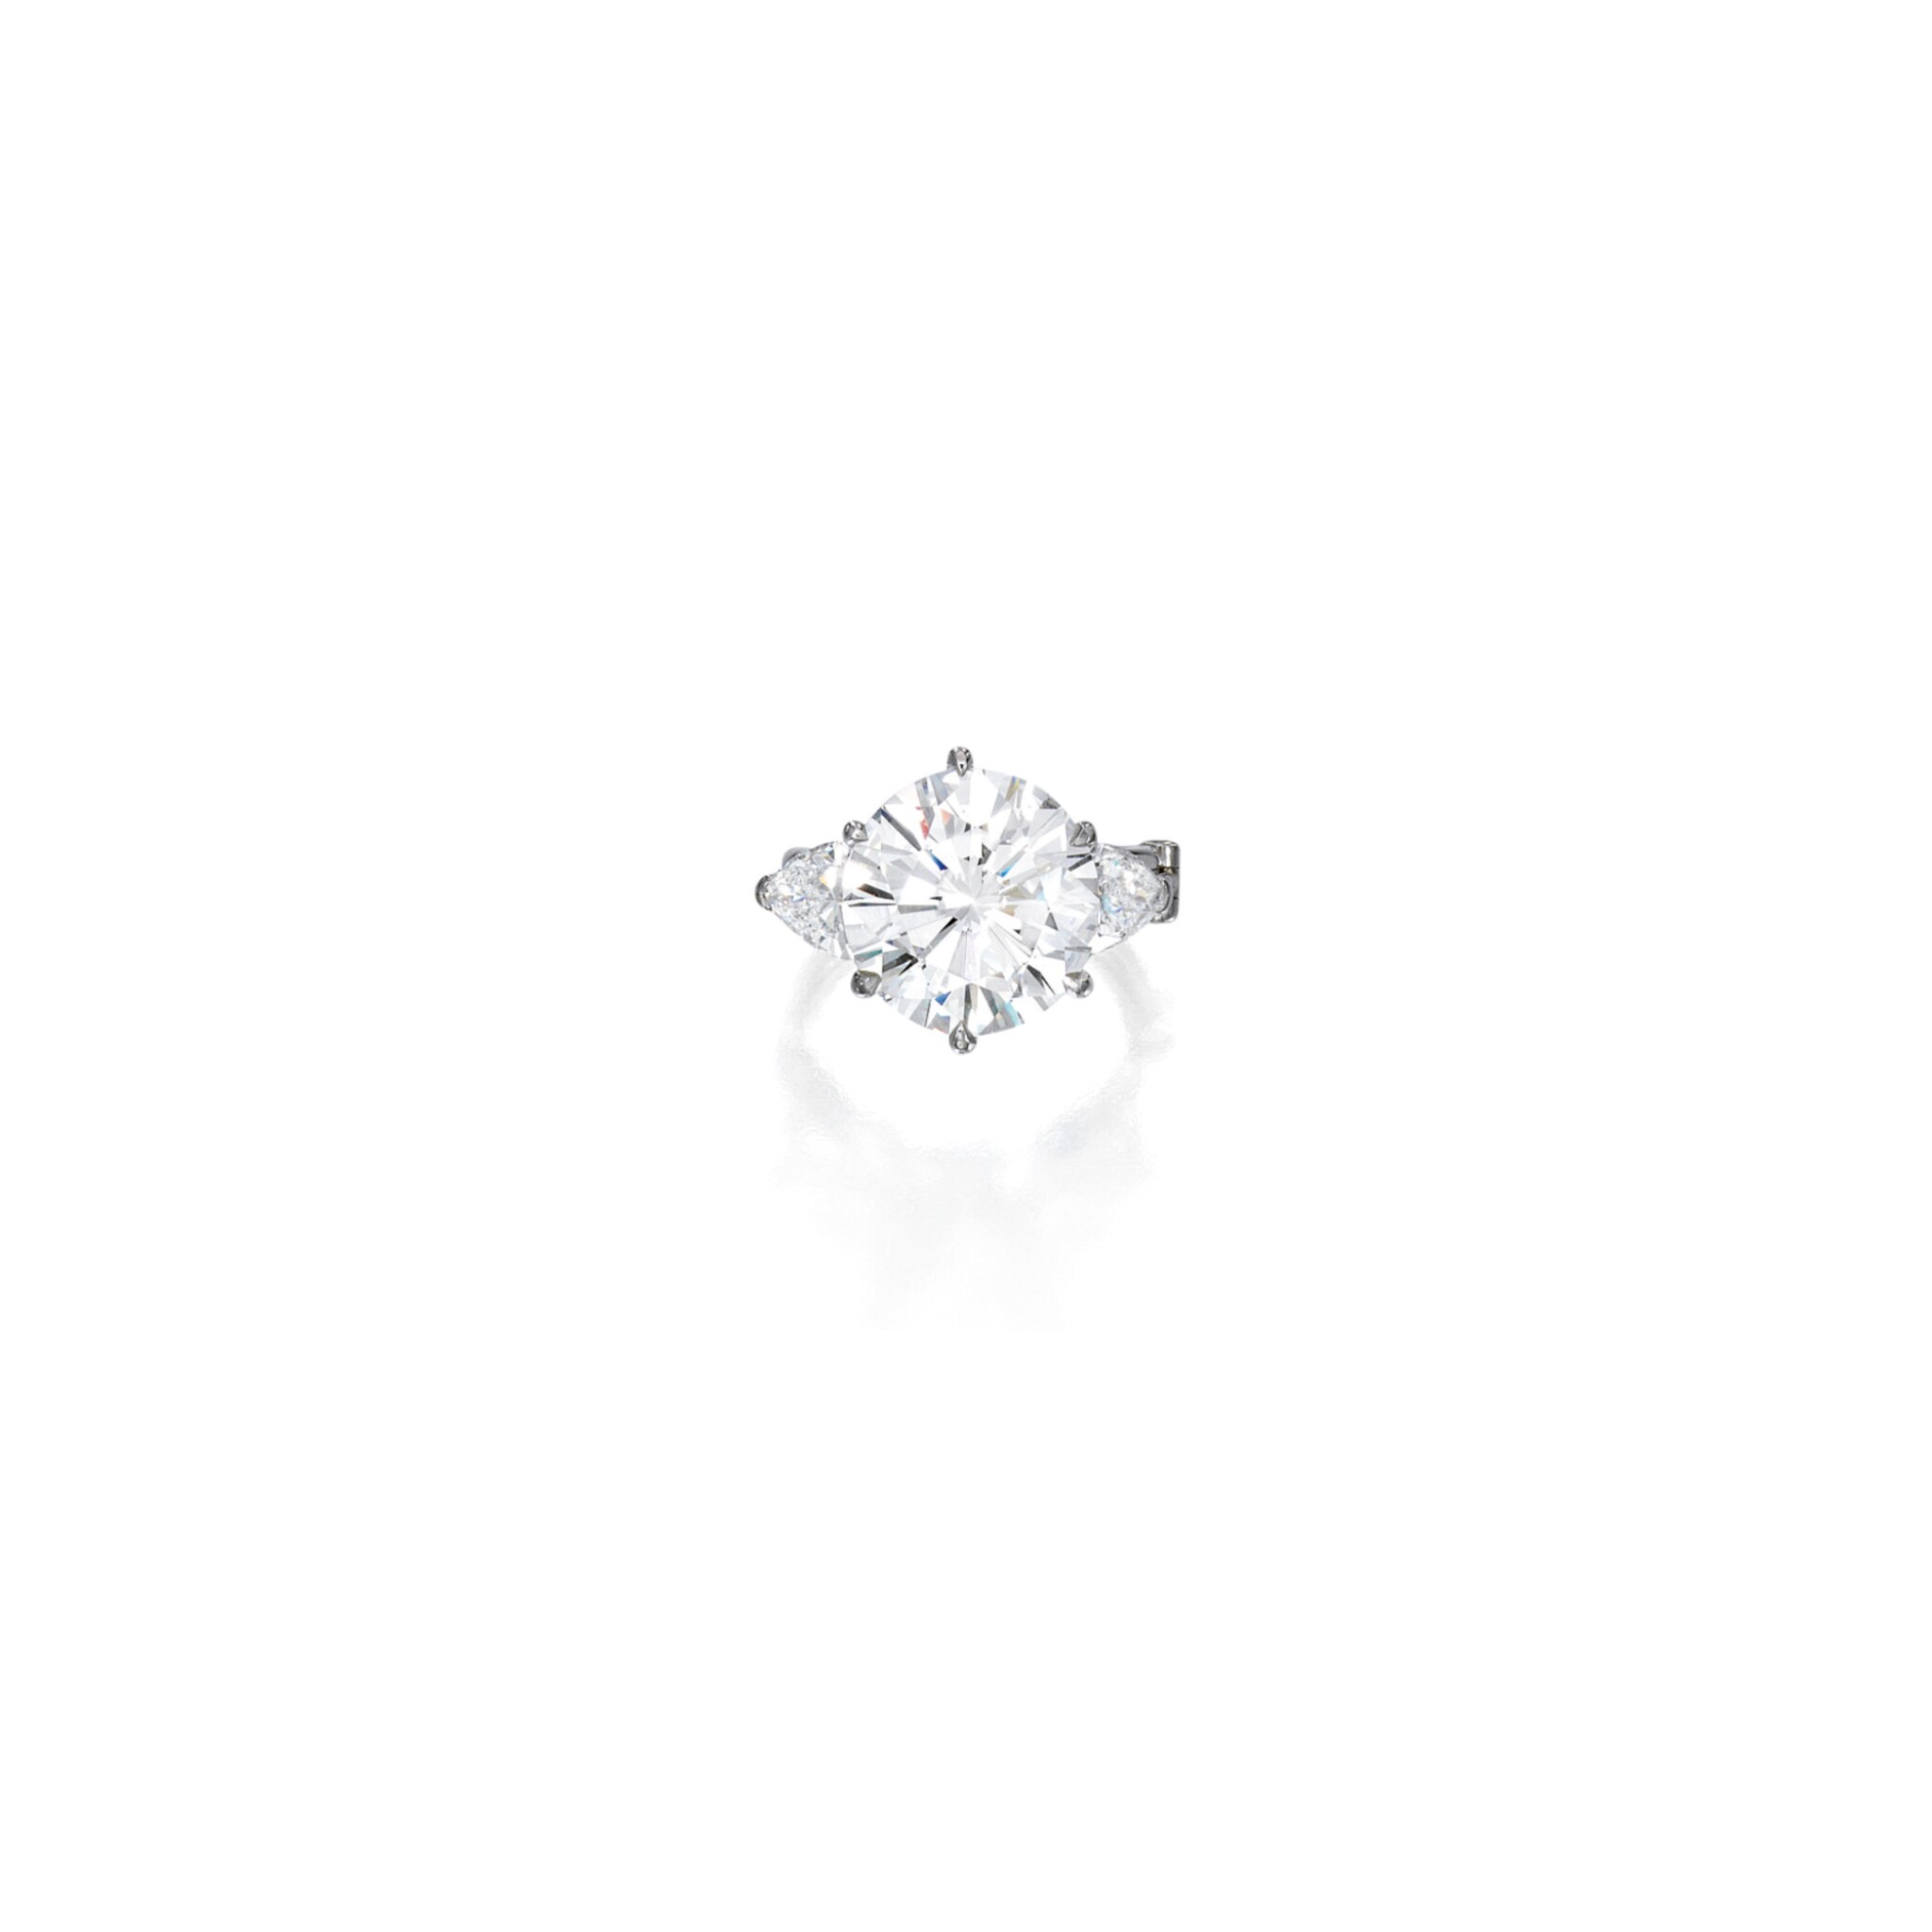 View full screen - View 1 of Lot 521. DIAMOND RING | 鑽石戒指.